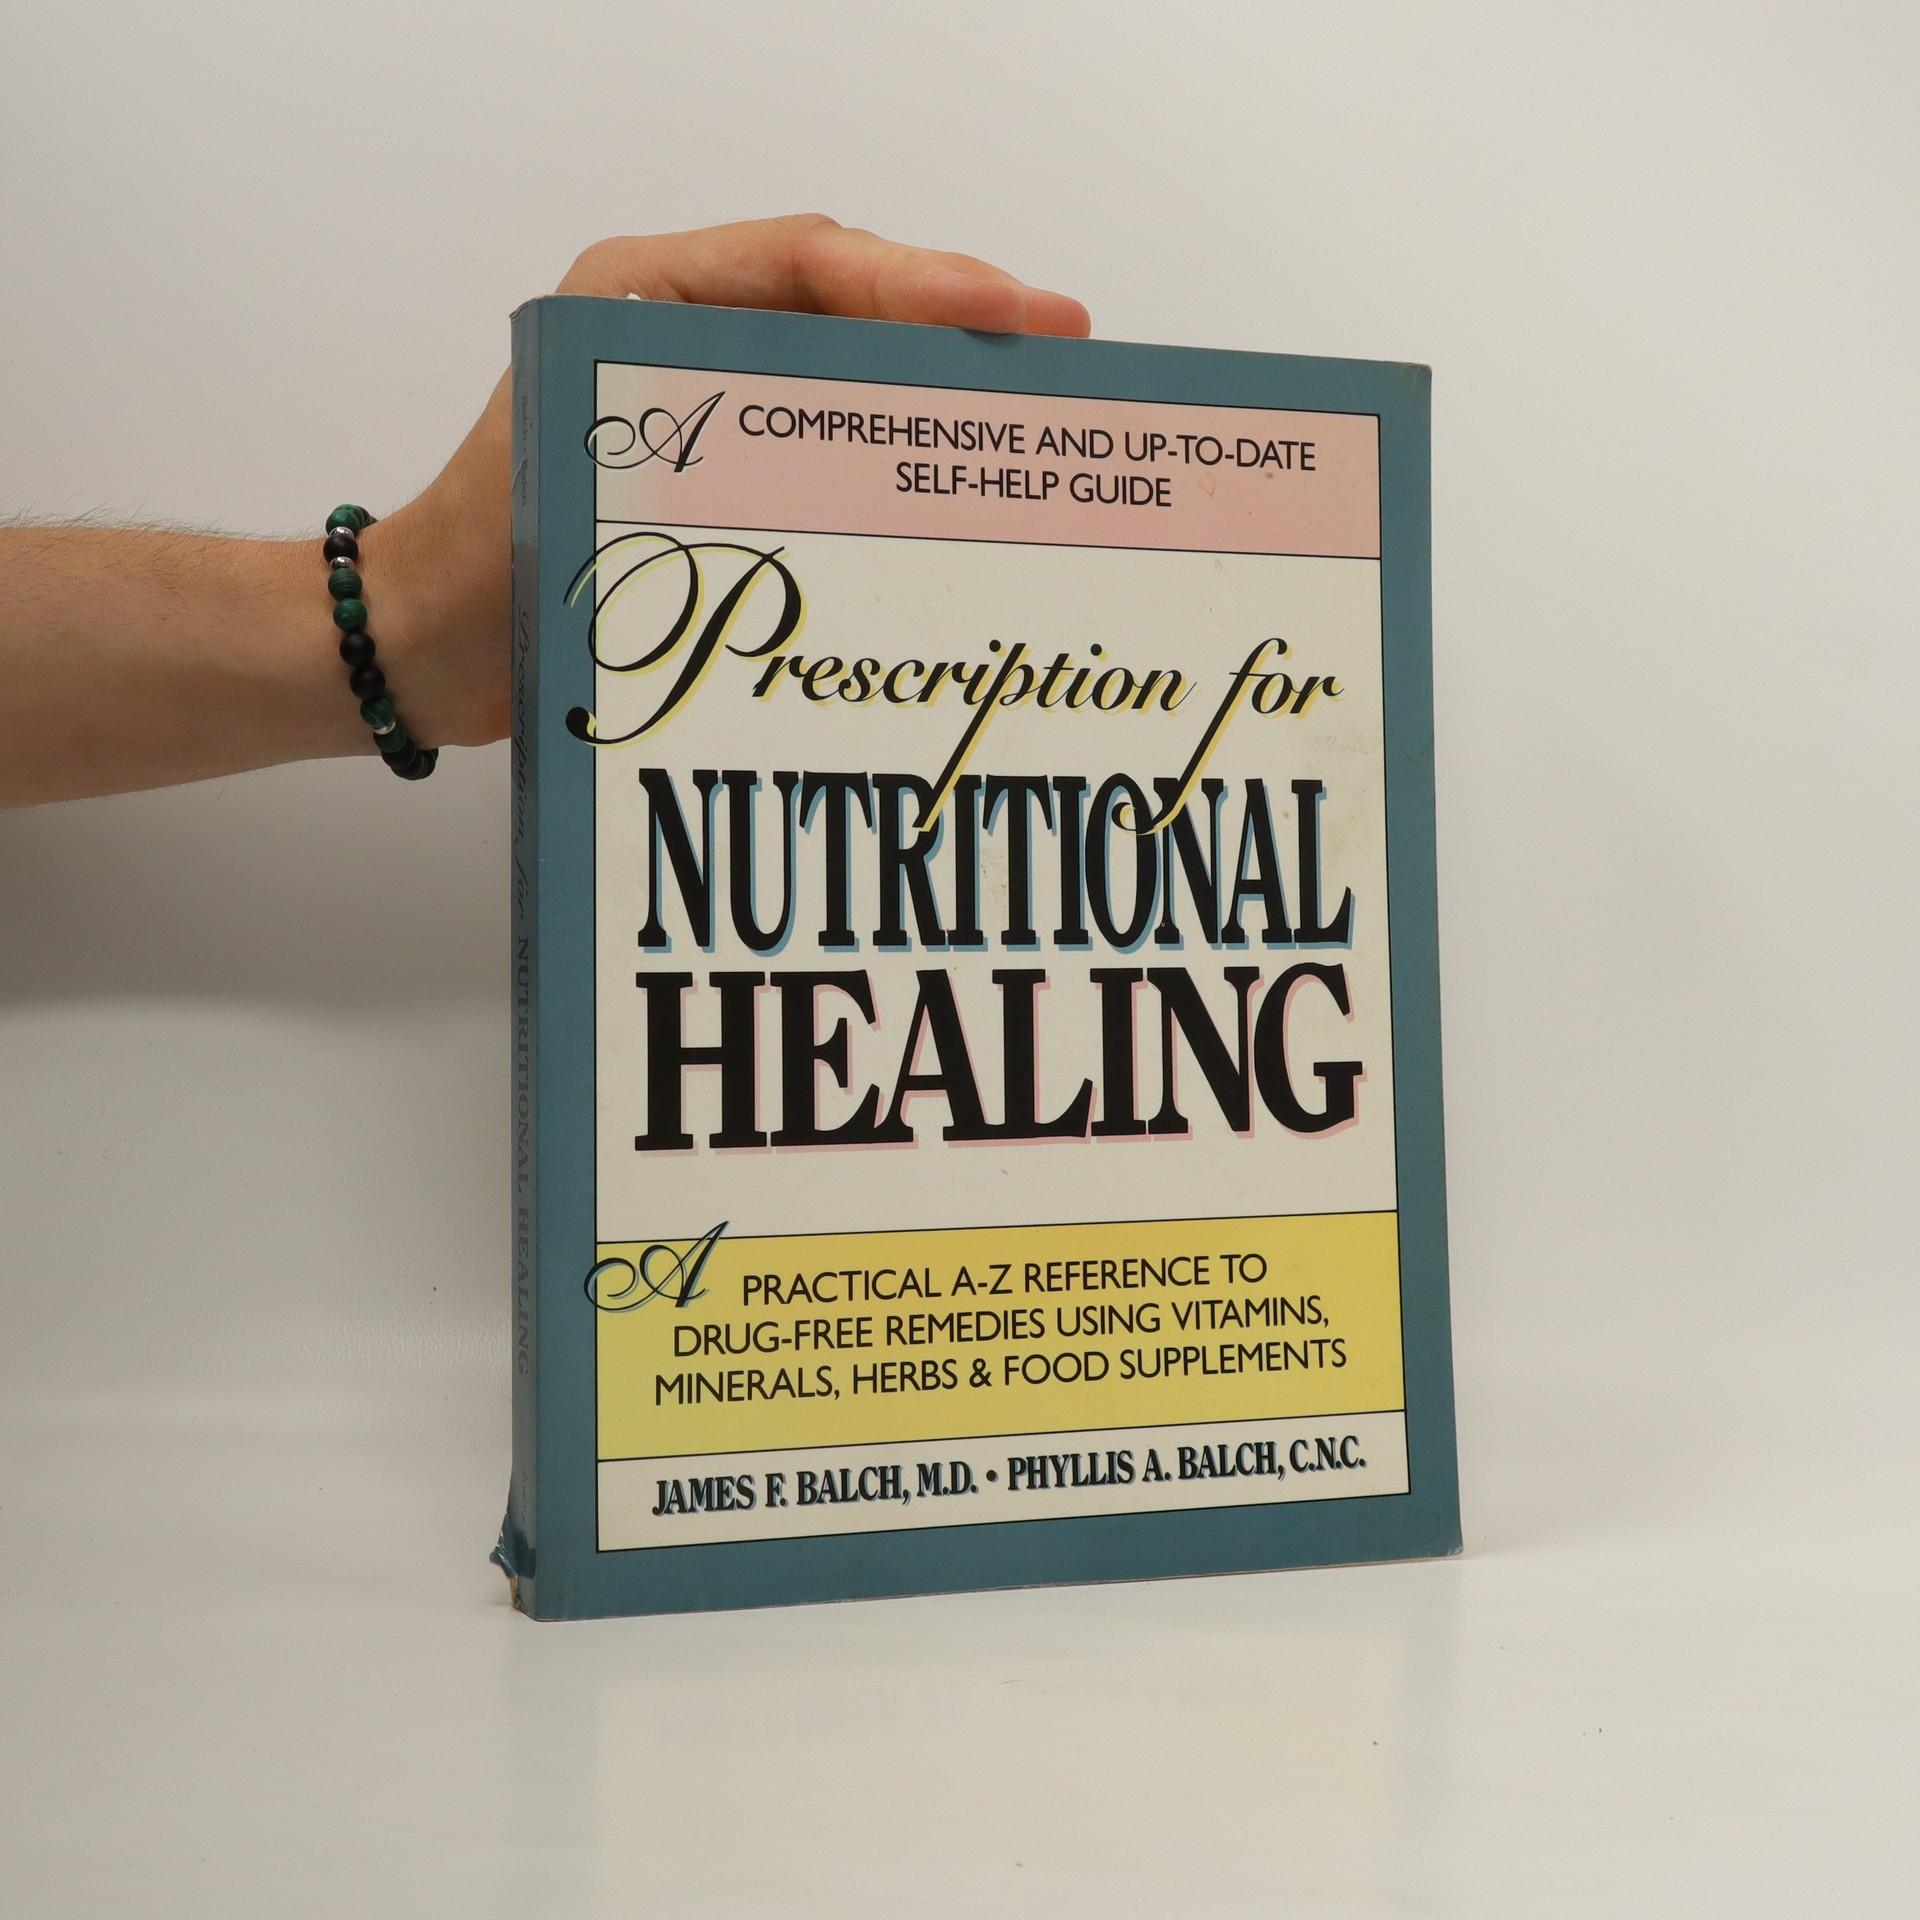 antikvární kniha Prescription for nutritional healing , neuveden